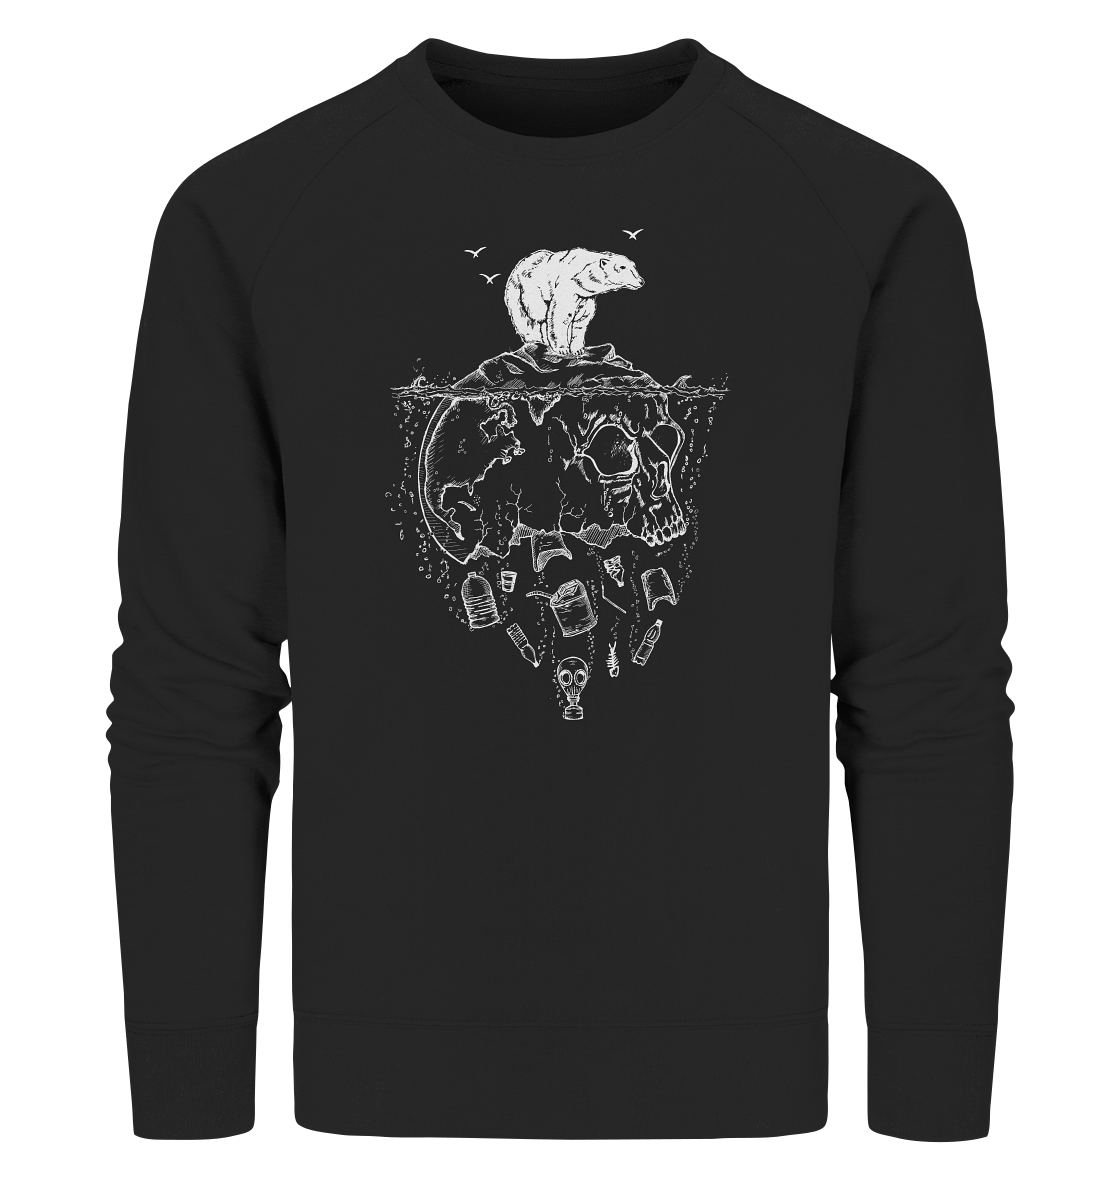 front-organic-sweatshirt-272727-1116x-4.png